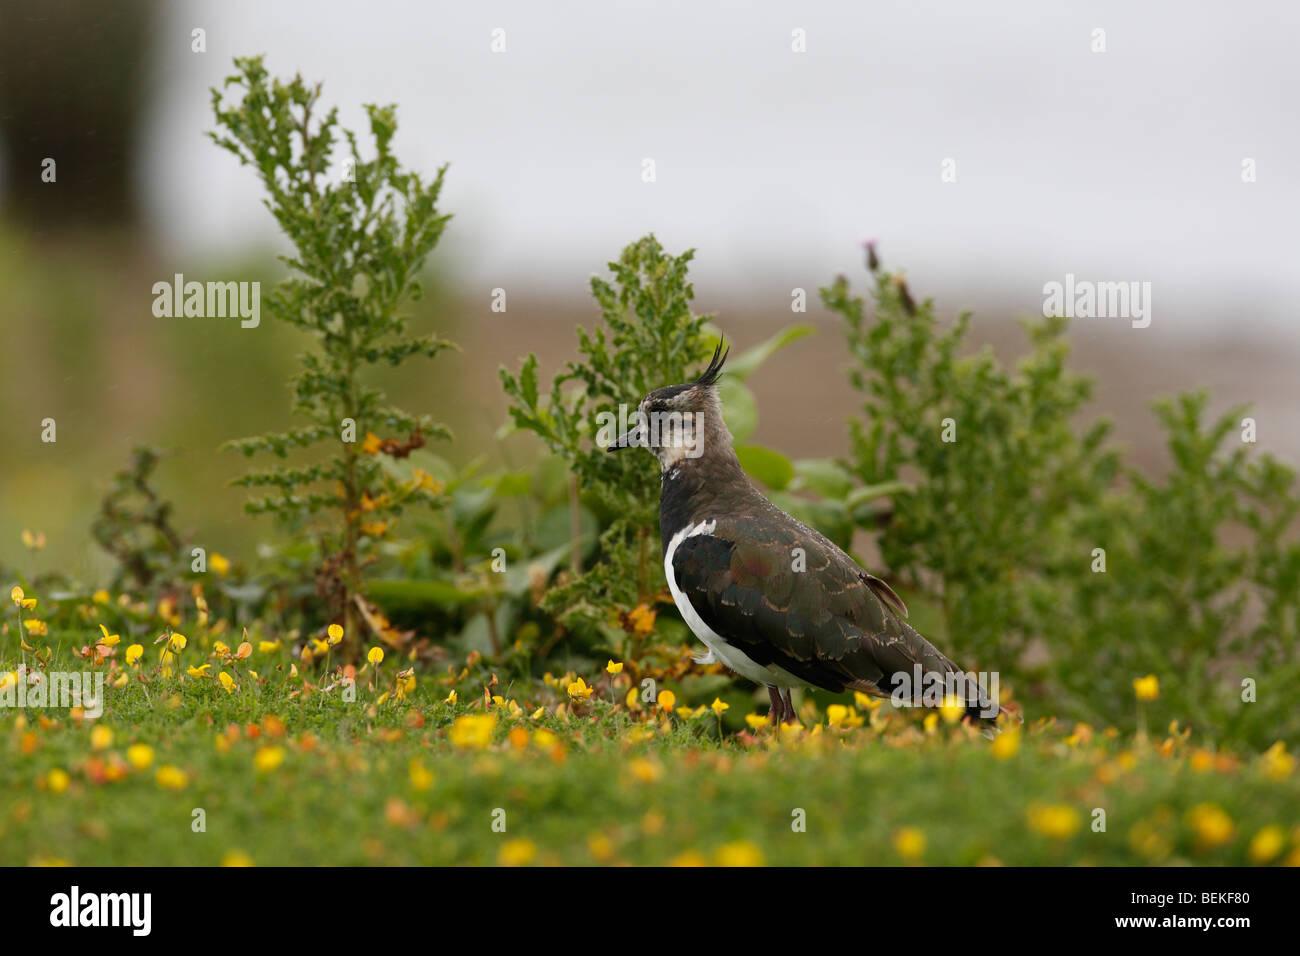 Lapwing (Vanellus vanellus) amongst buttercups - Stock Image